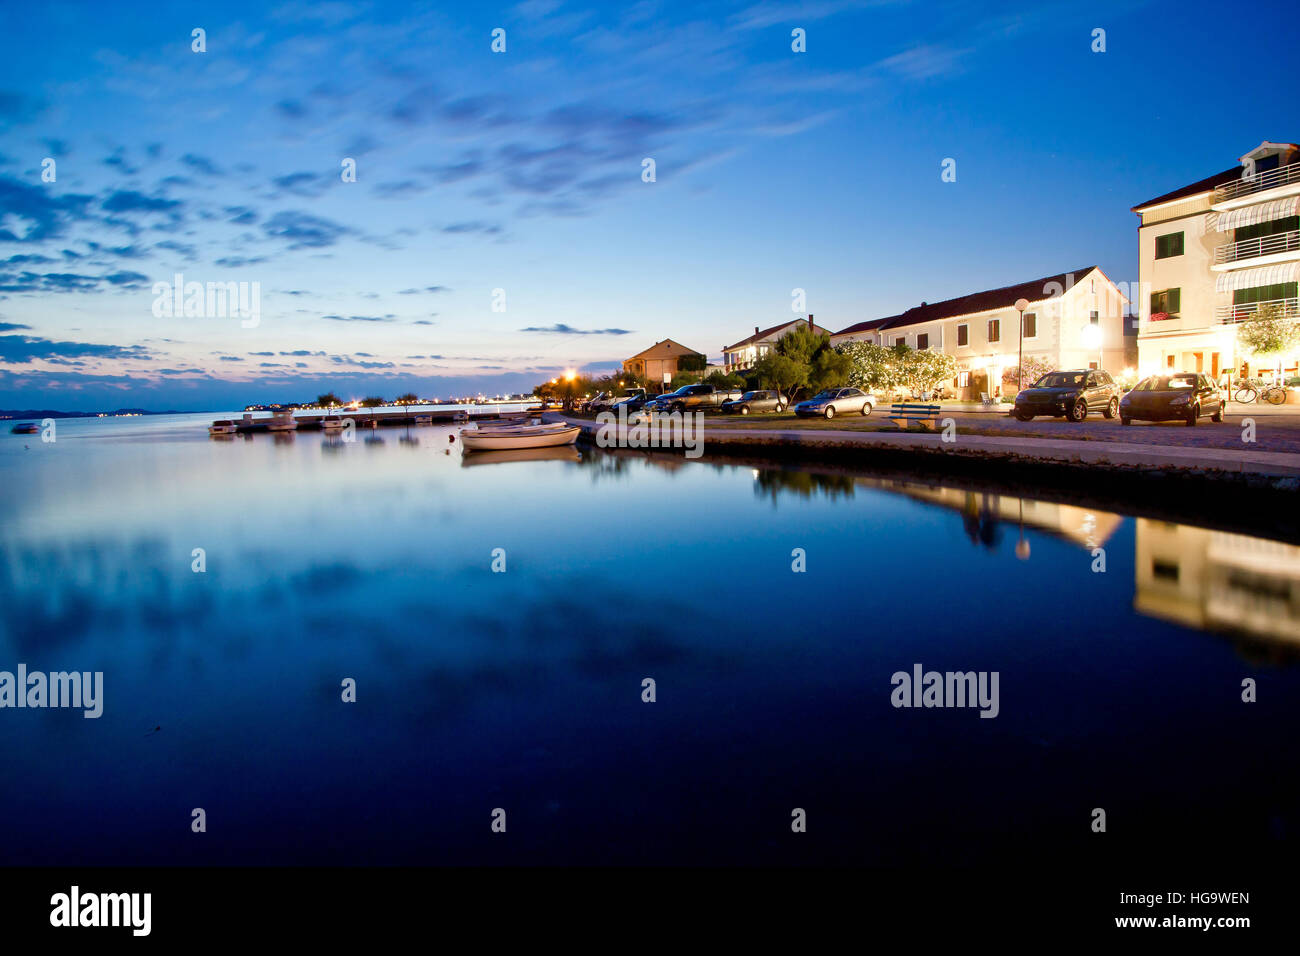 Sukosan waterfront calm sea evening view in Dalmatia, Croatia - Stock Image